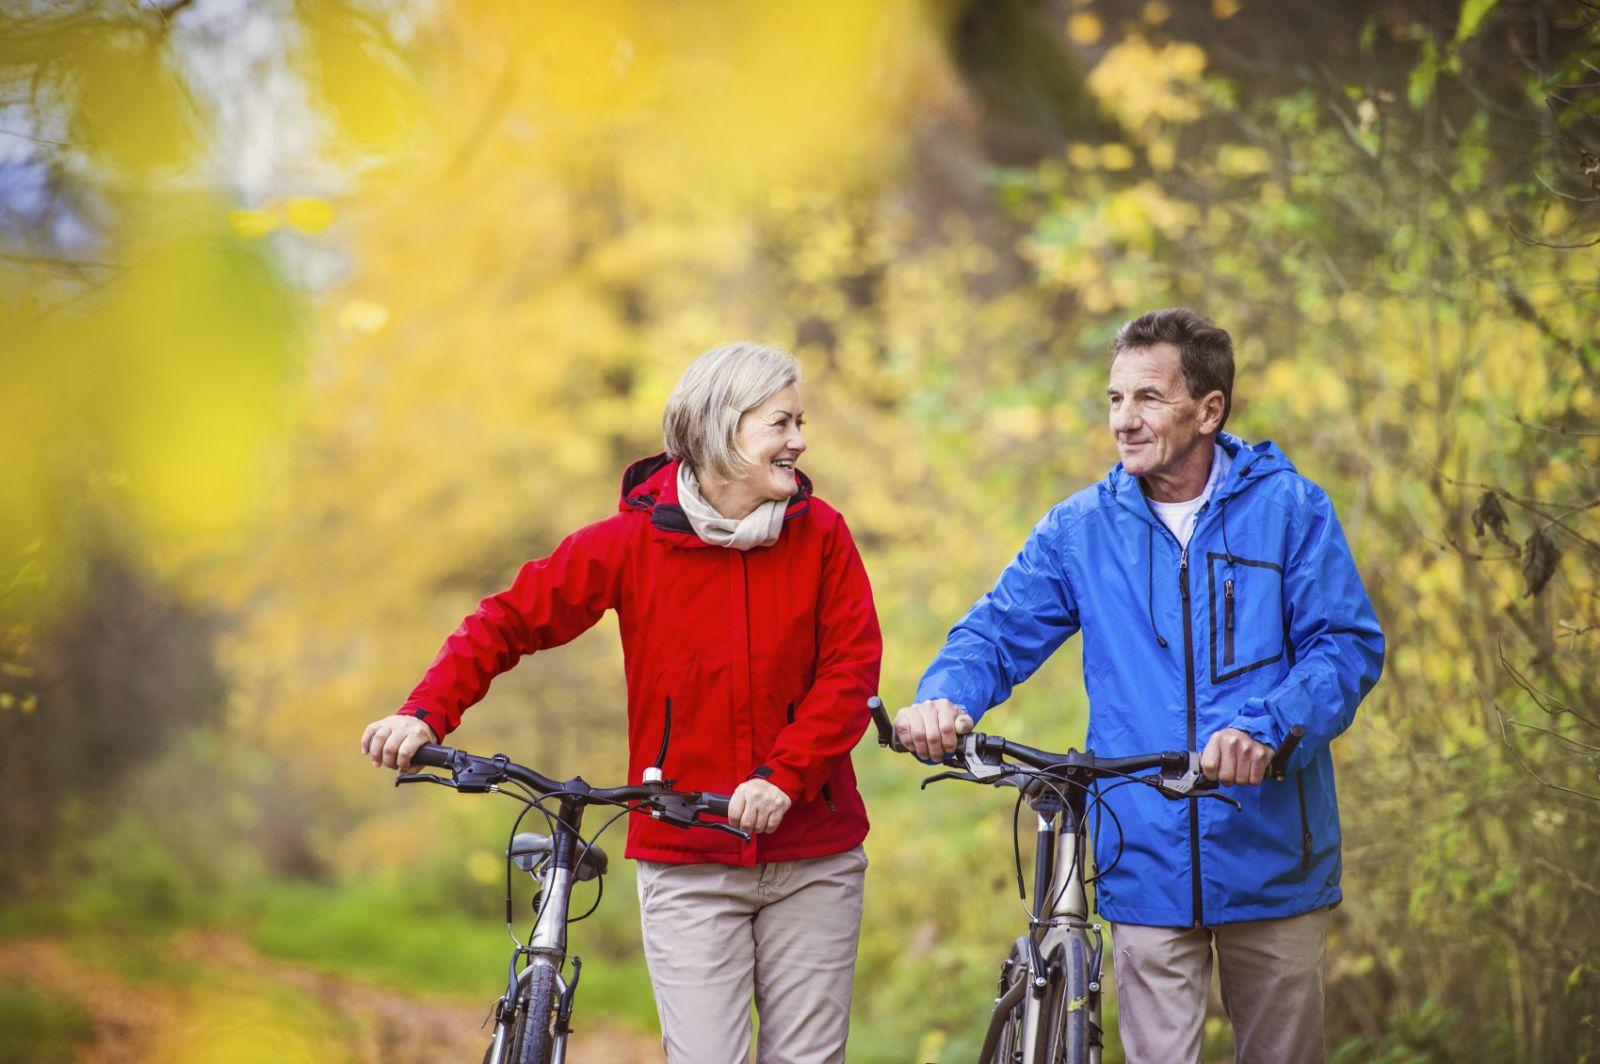 randevú idősebb férfi tippeket